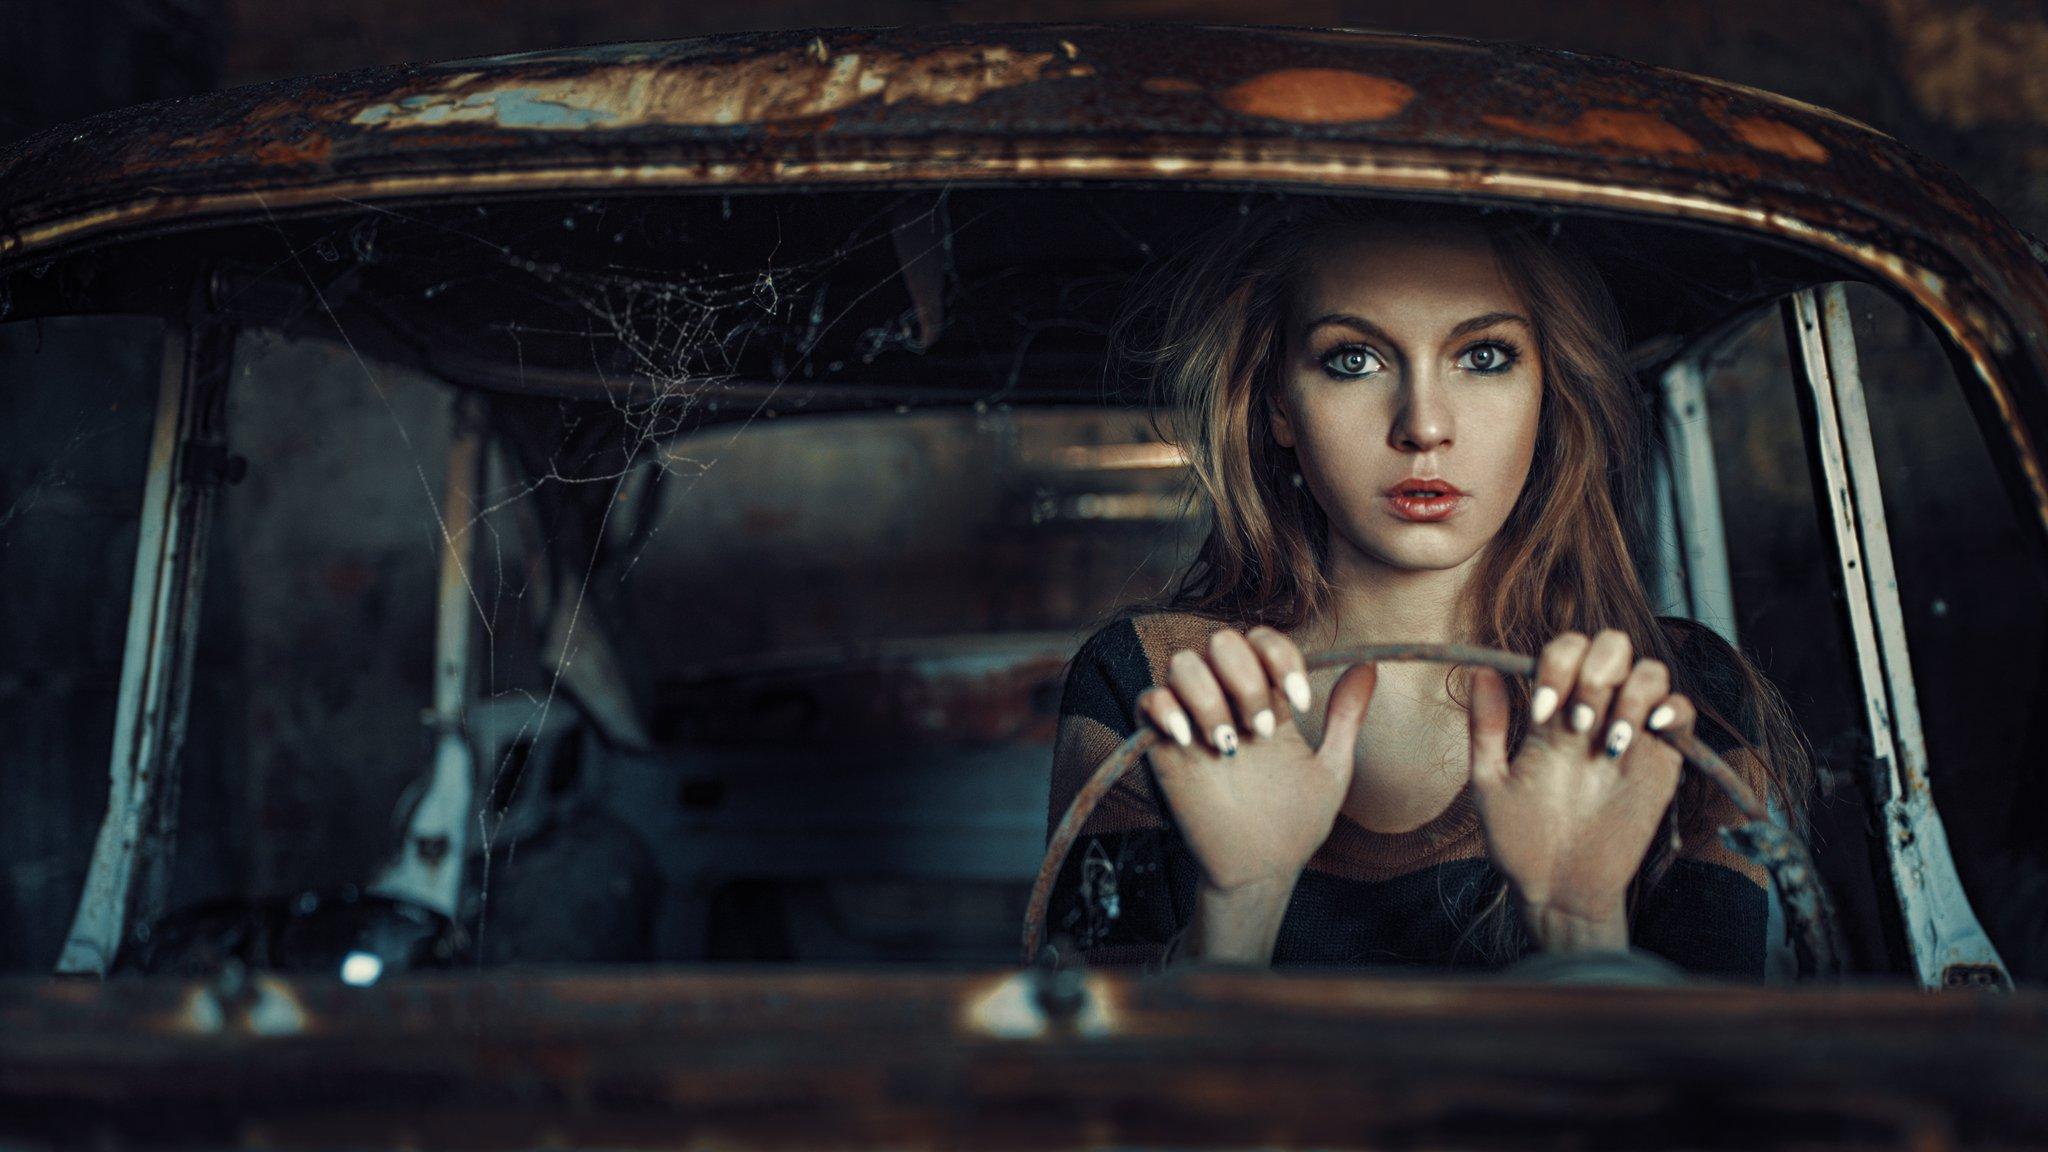 Cinematic, Model, Mood, Portrait, Damian Piorko